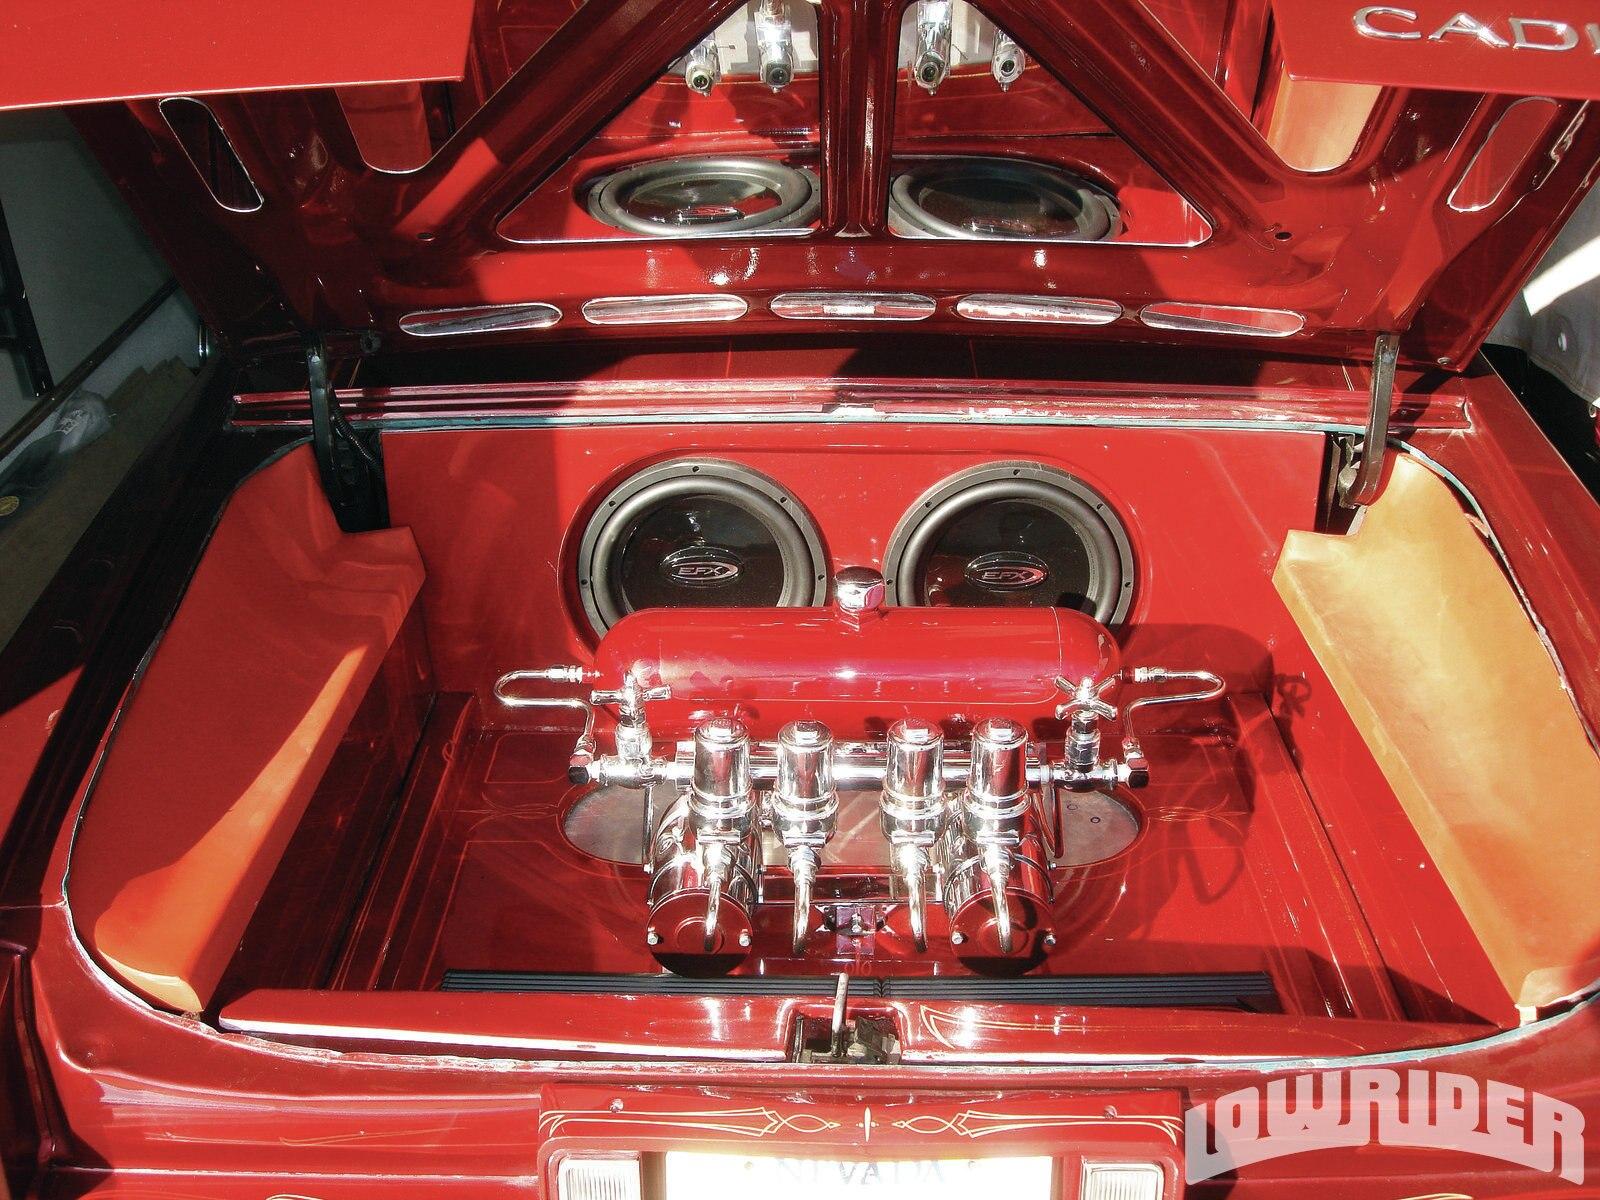 1110-lrmp-37-o-custom-trunk-overhaul-painted-panels2